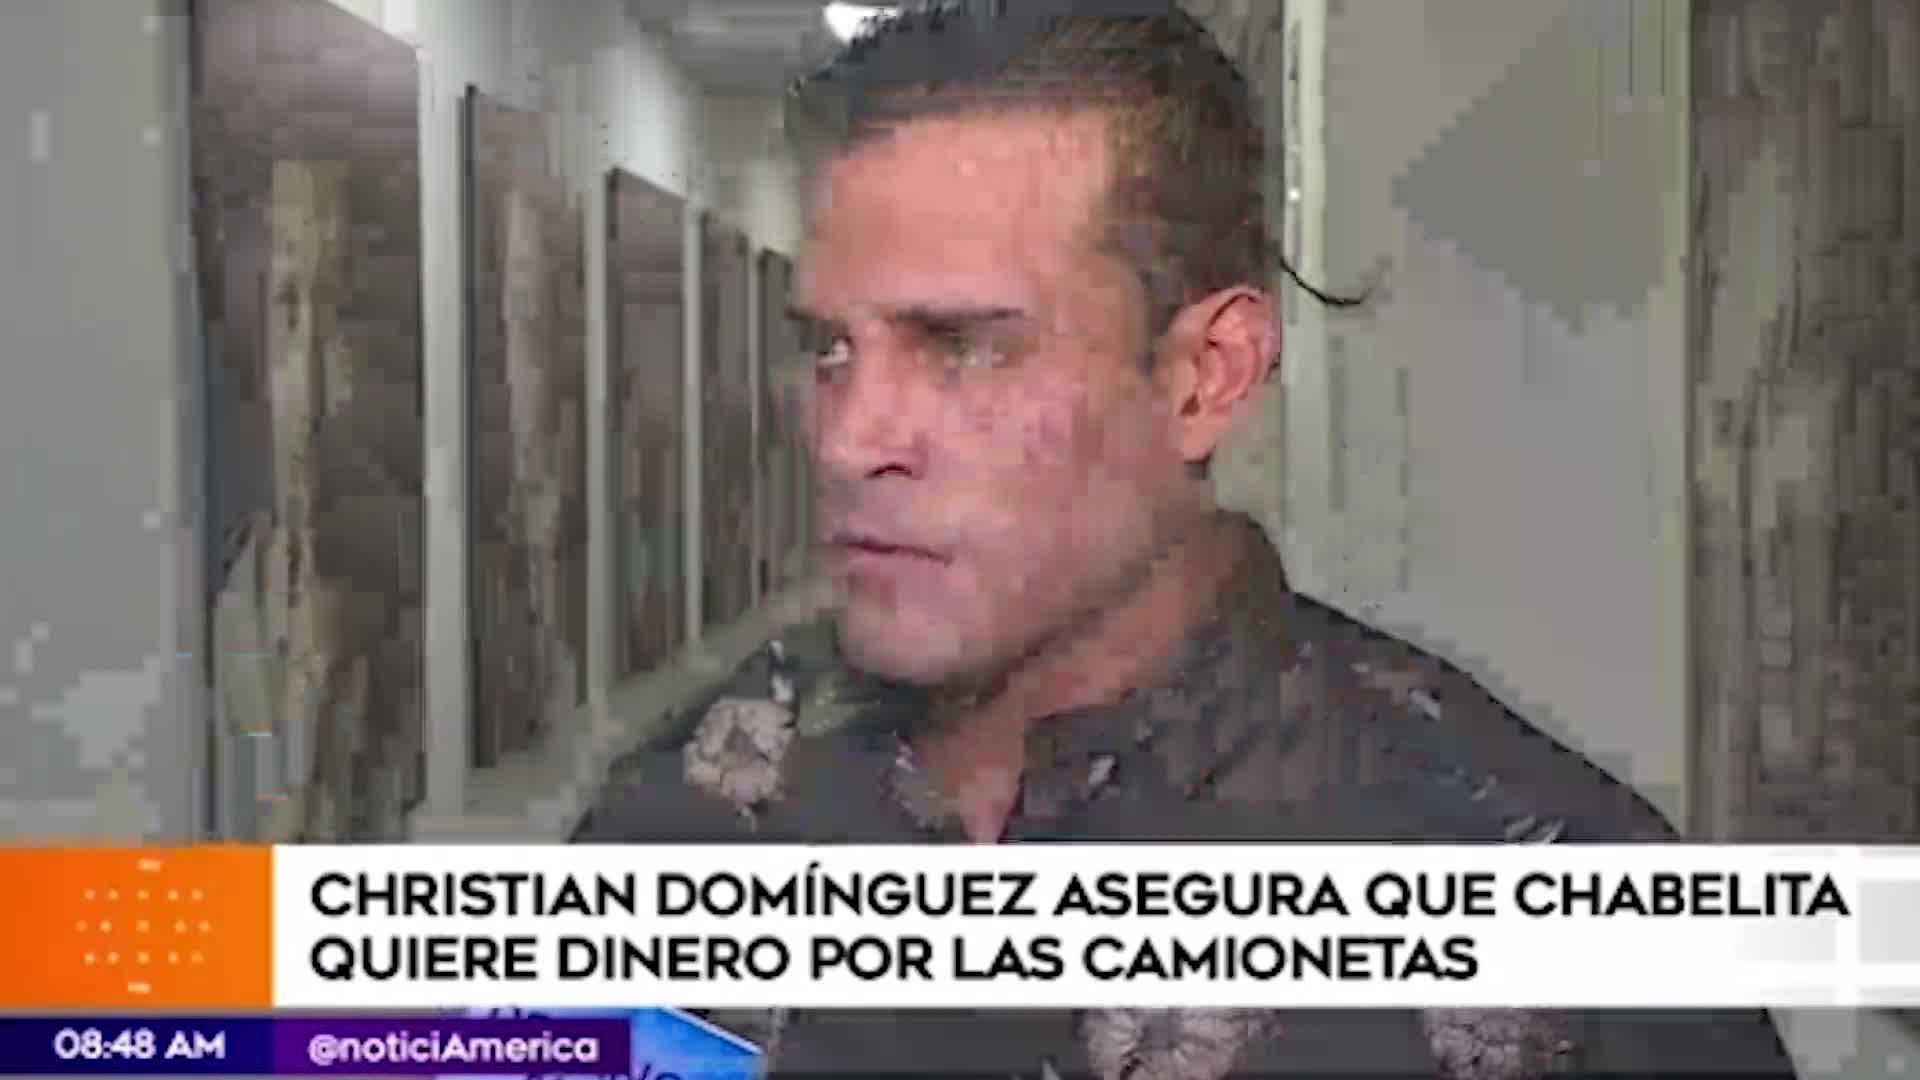 Christian Domínguez acusa a expareja de pedirle dinero por transferencia de vehículo